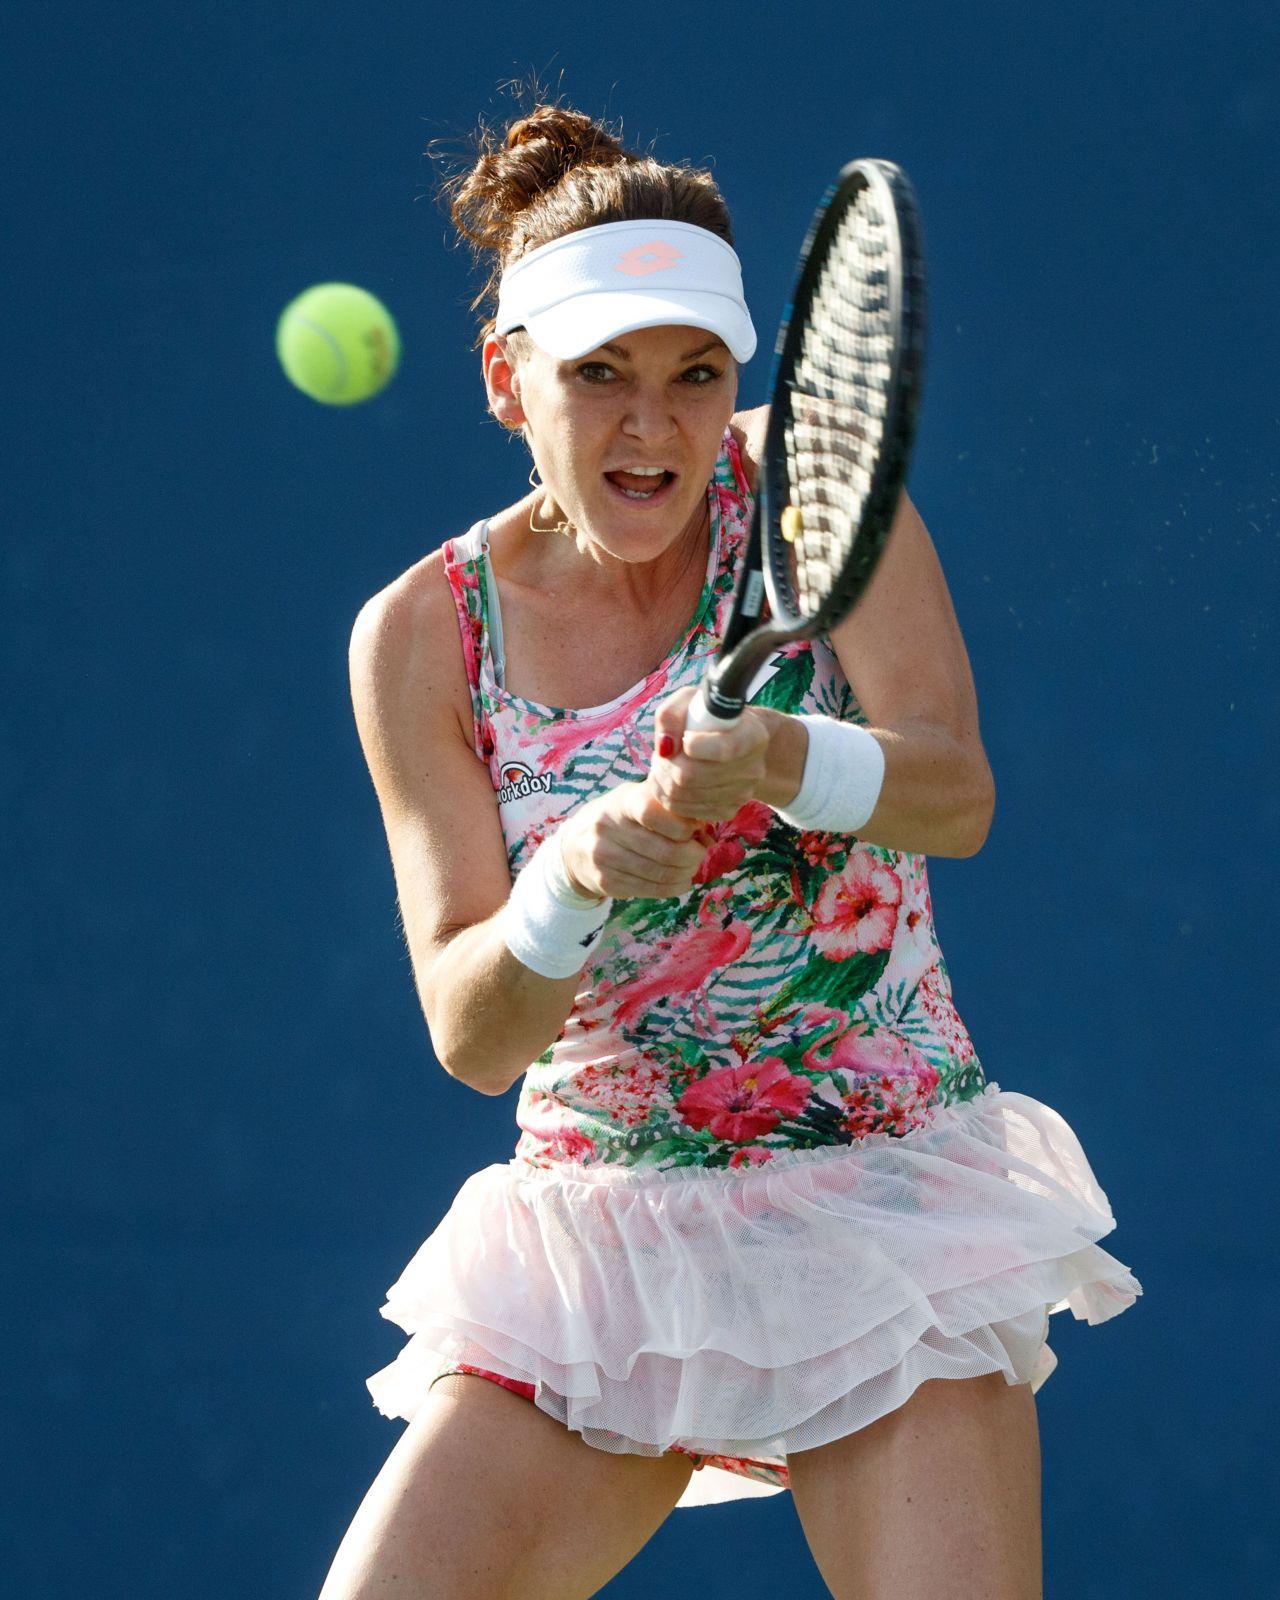 Agnieszka Radwanska – 2017 US Open Tennis Championships 08/30/2017